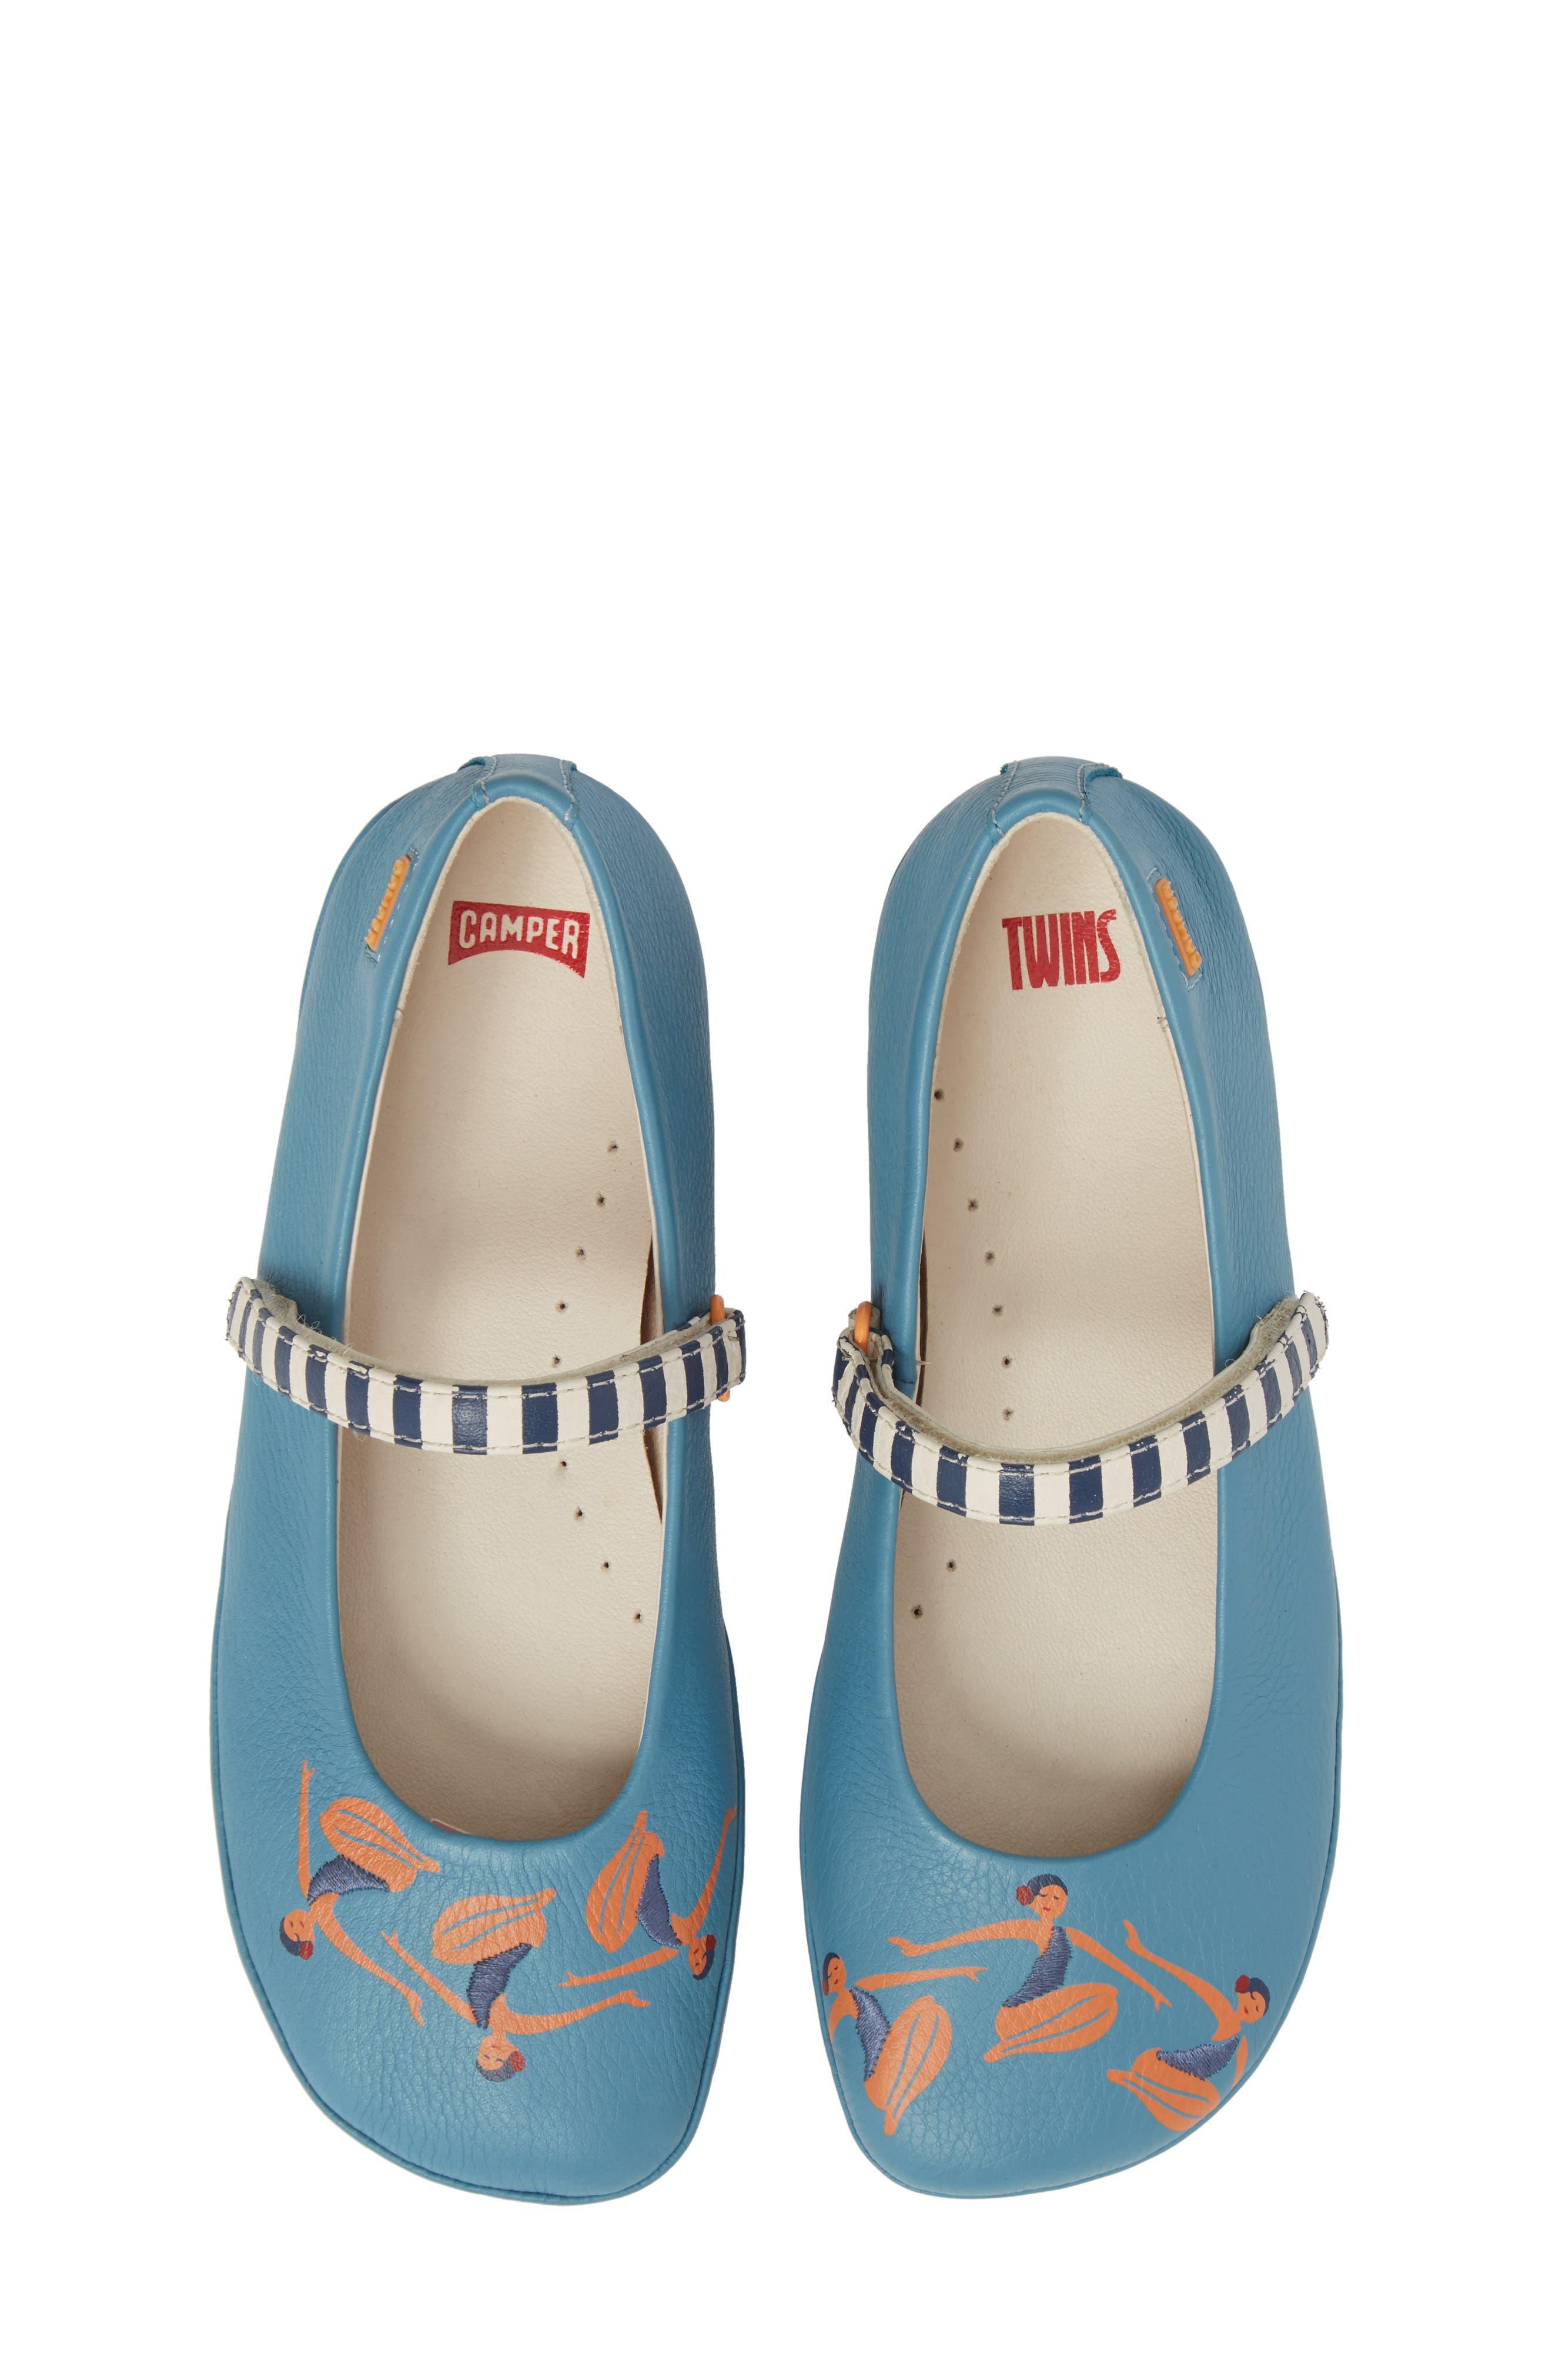 Twins Mary Jane Flat,                             Main thumbnail 1, color,                             Blue